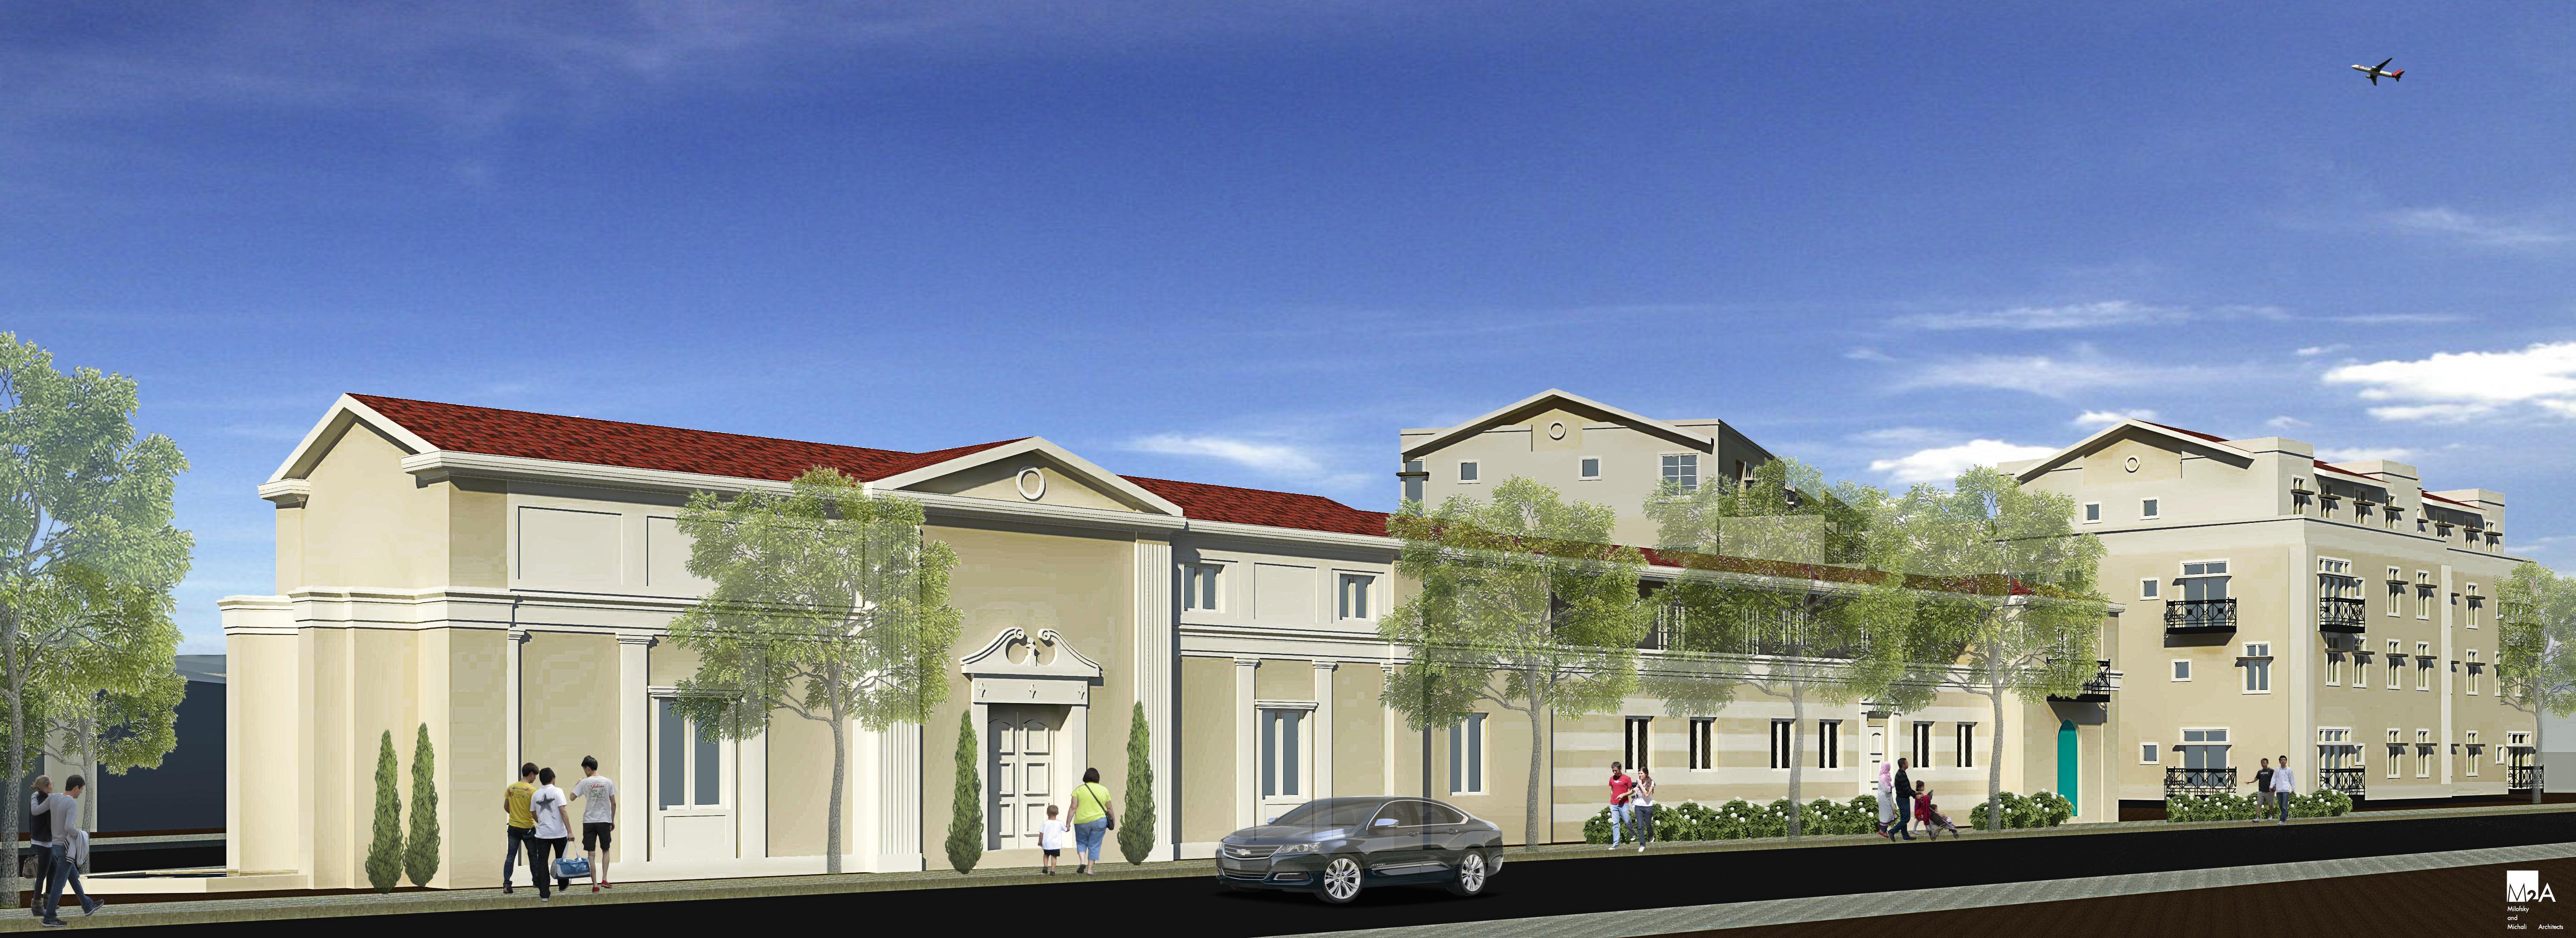 Paul_Williams_(affordable_housing).jpg